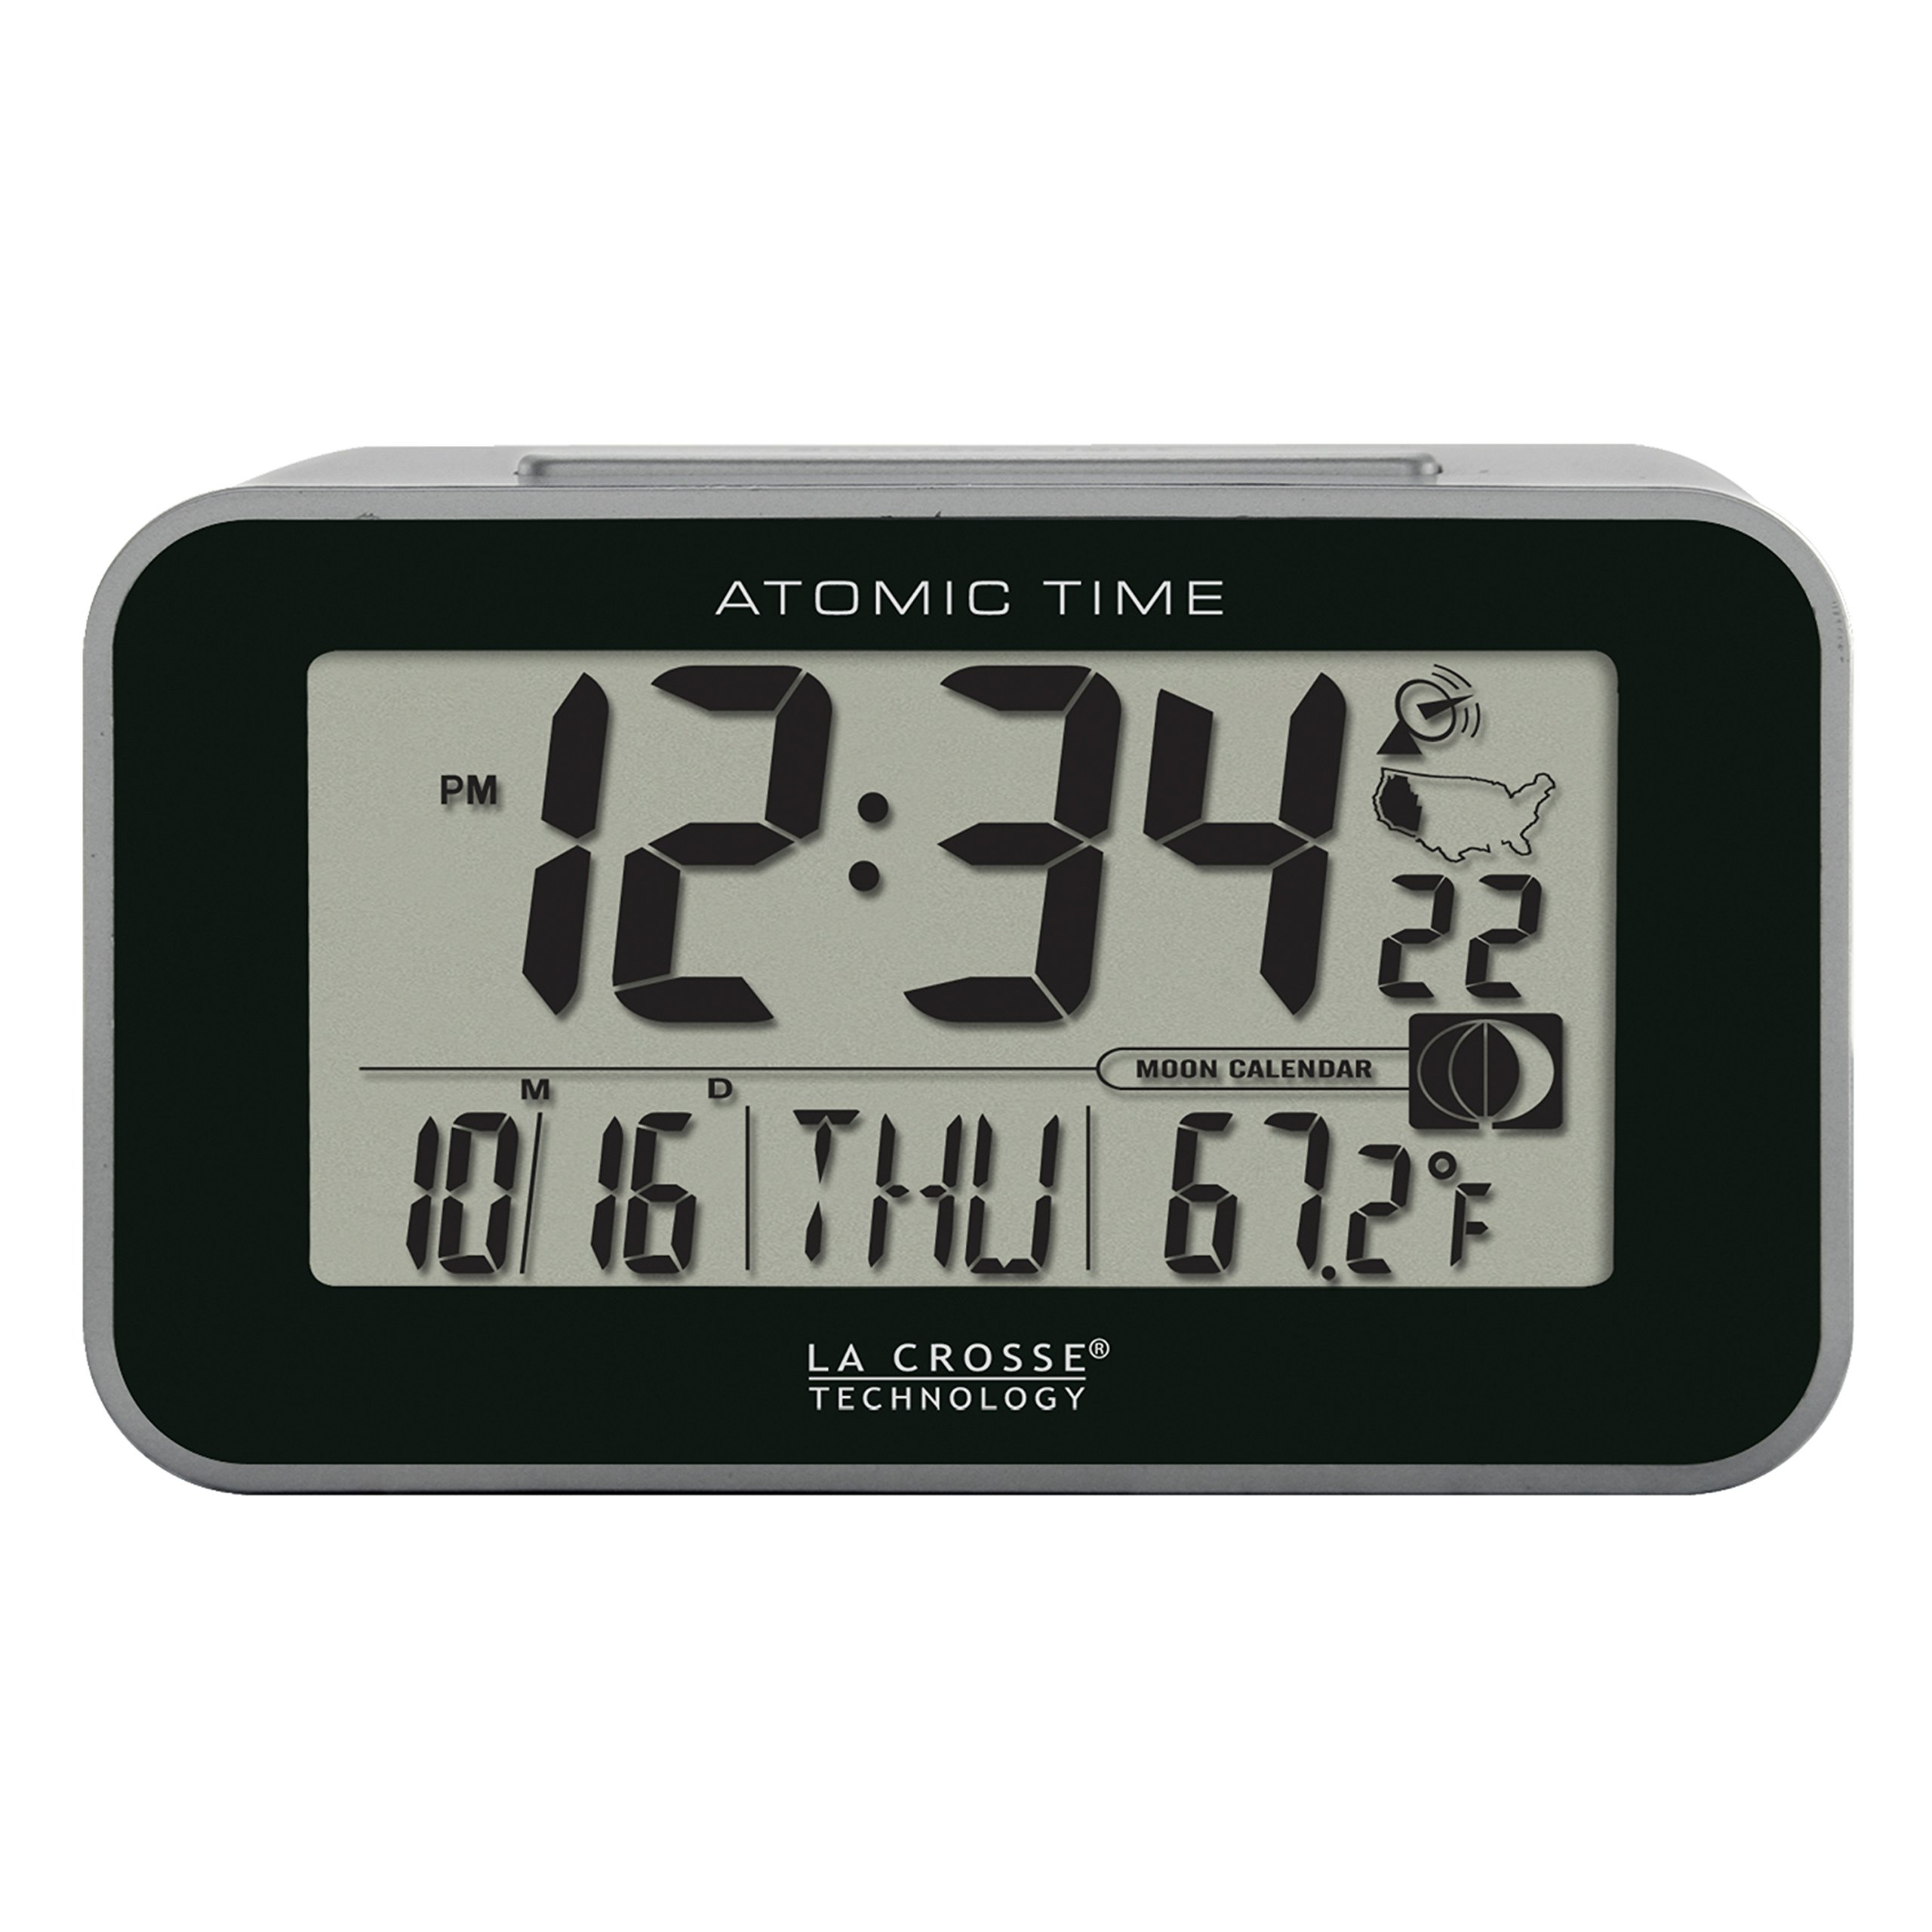 La Crosse Technology 617-1270 Atomic Digital Alarm Clock, Black